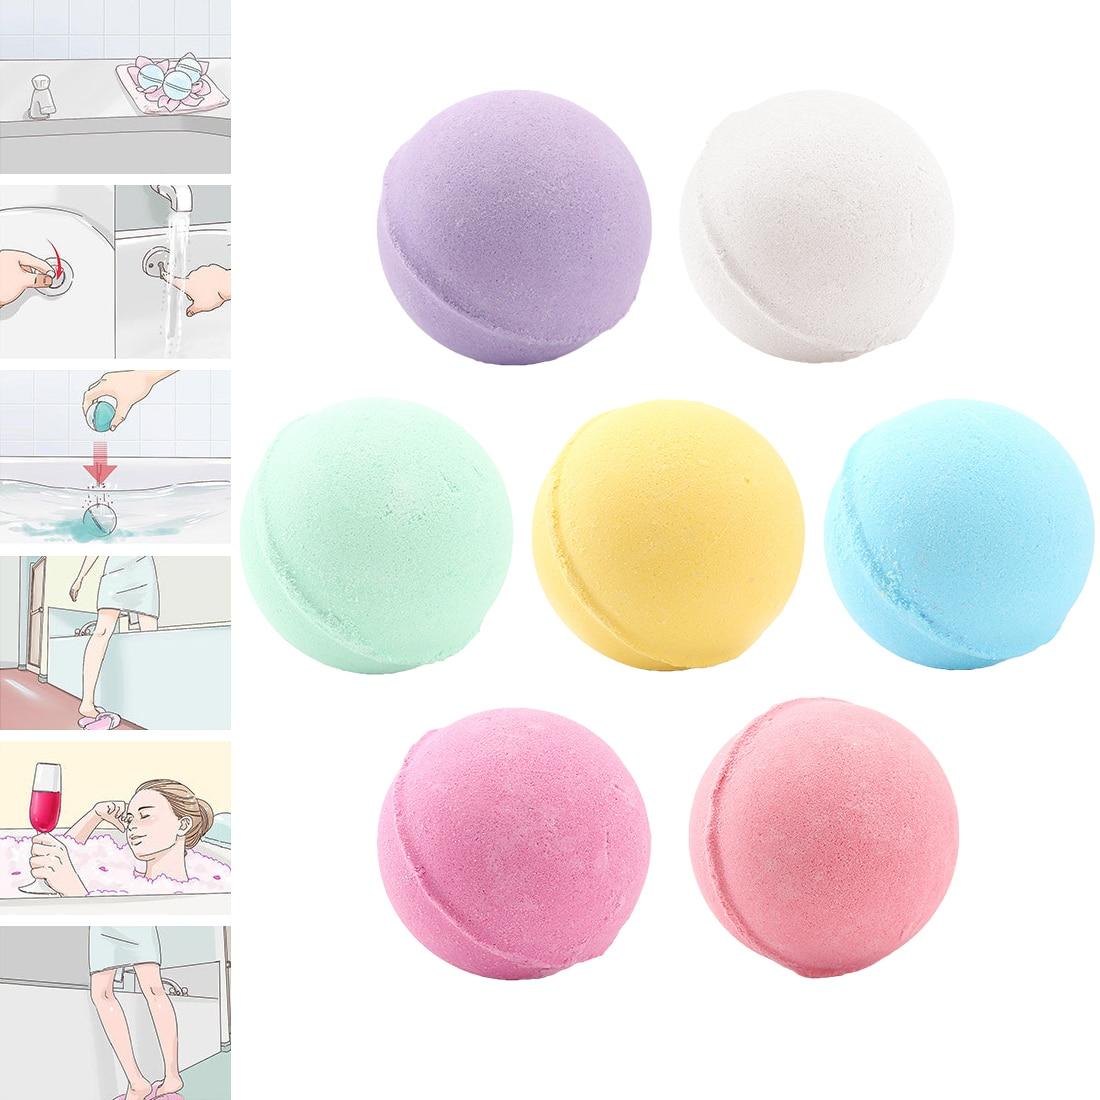 1pcNatural Bubble Bath Bombs Shape Deep Sea Bath Salt Body Bath Ball Ball Rose/Green tea/Lavender/Lemon/Milk random kataoka matcha green tea milk 705oz